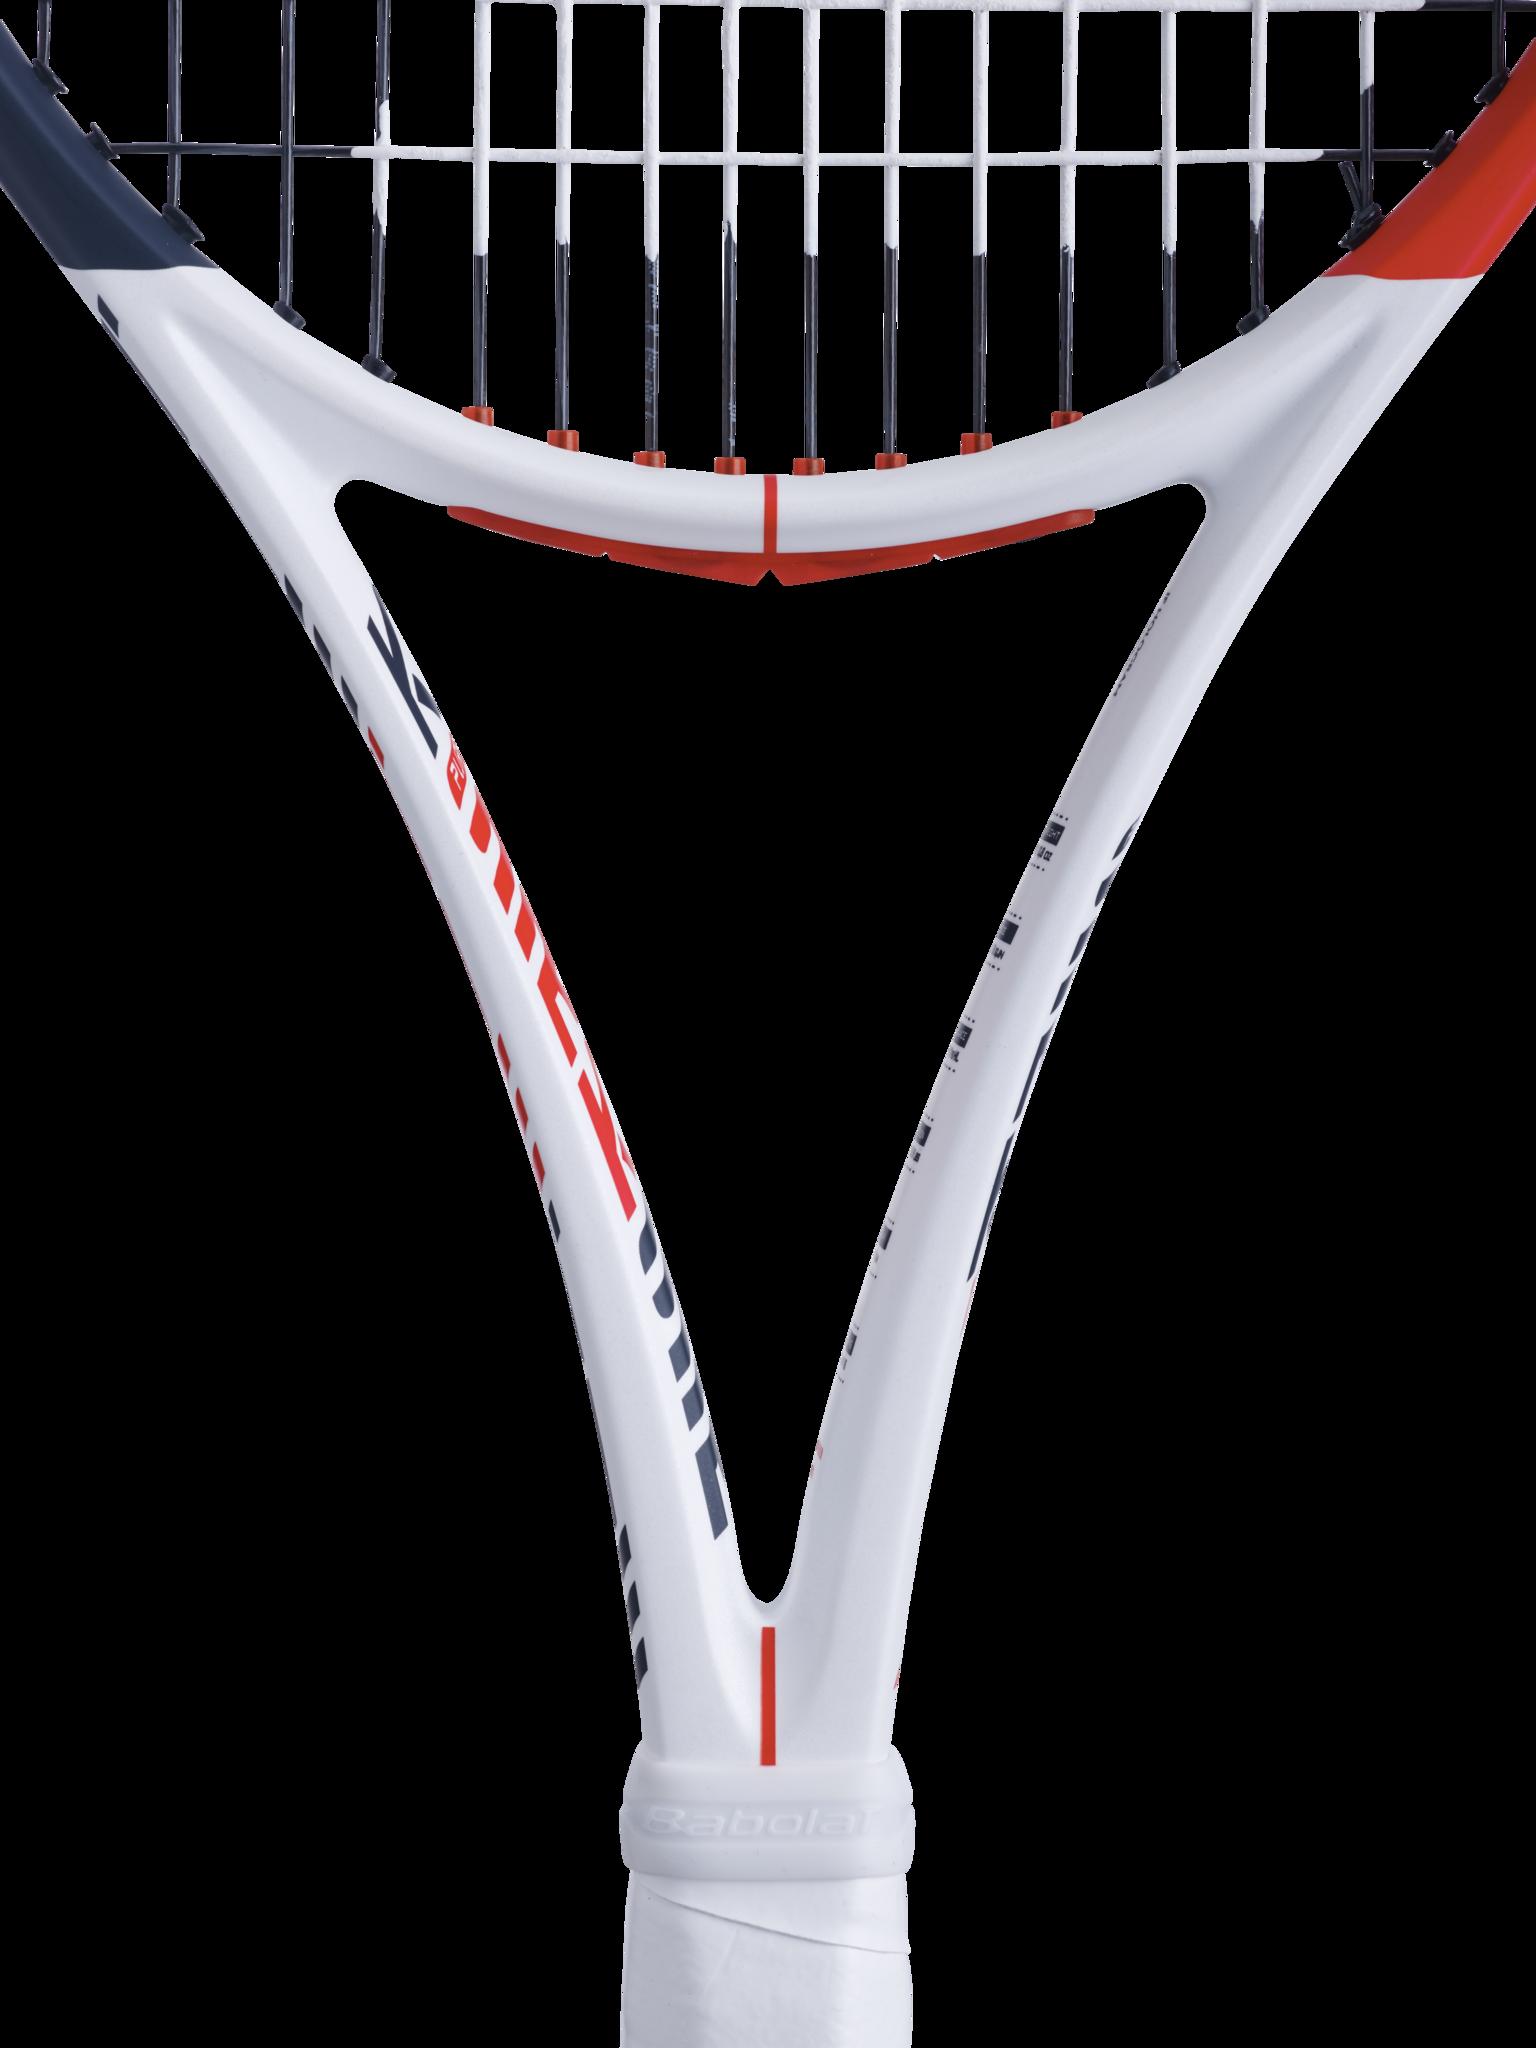 Sharp Control and Pinpoint Precision Babolat Pure Strike 3rd Gen 16x19 Tennis Racquet Dominic Thiems Racquet